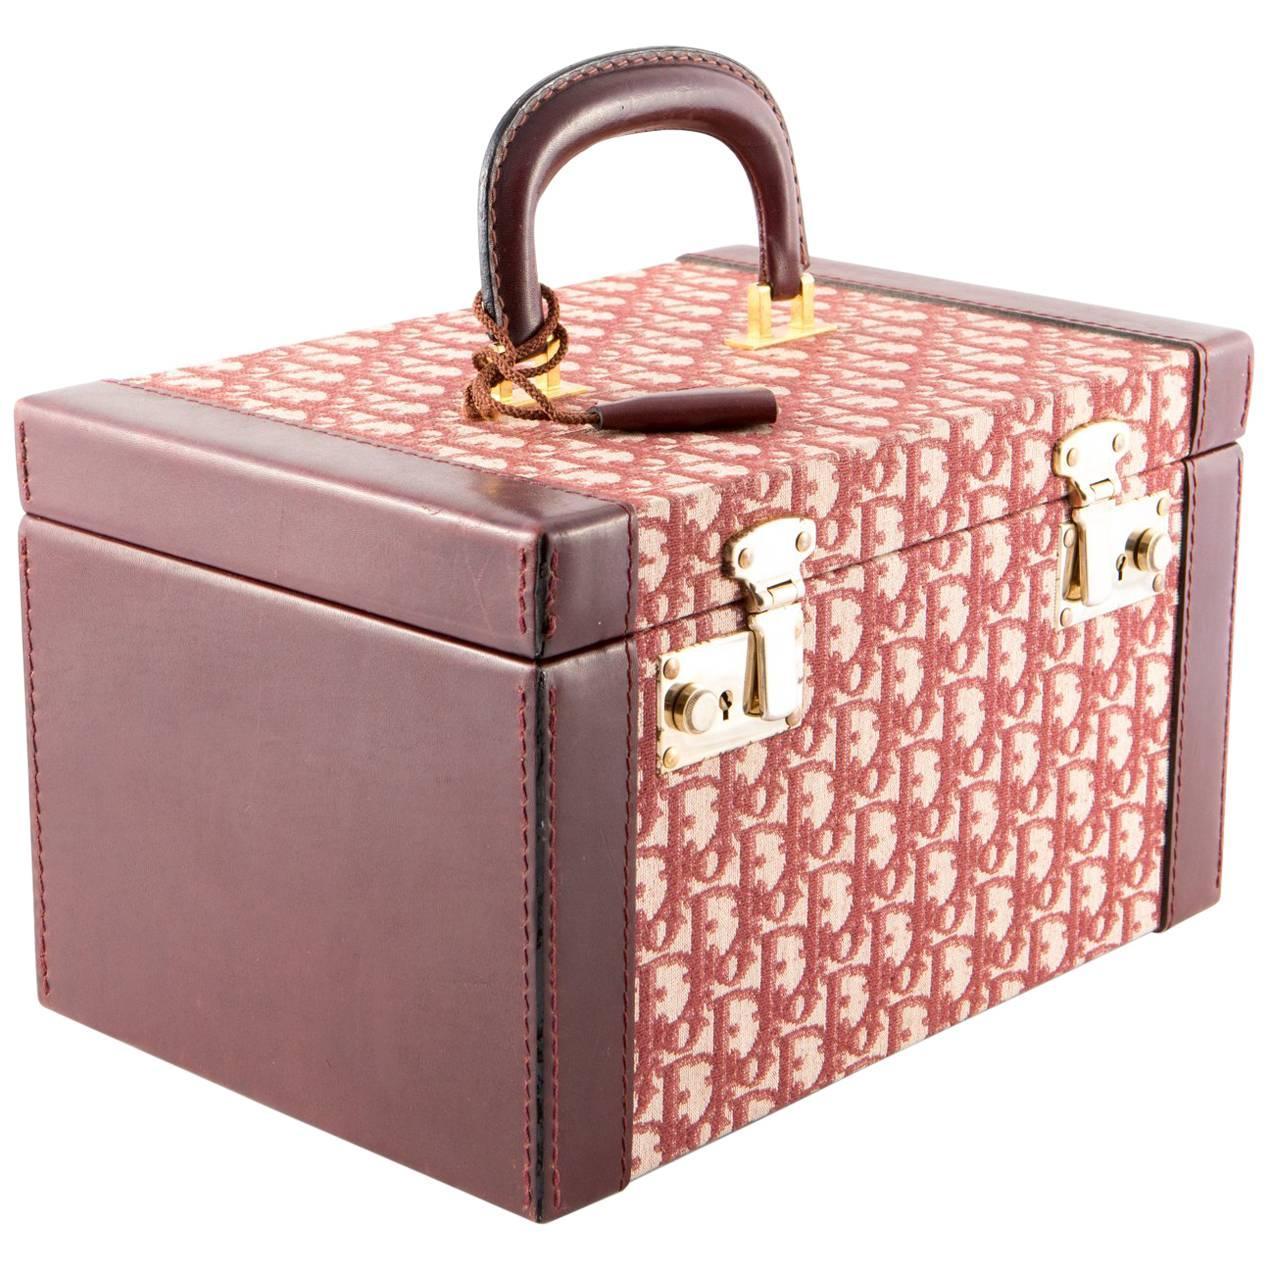 Dior Dior Bordeaux Vanity Case Bag, 1970s